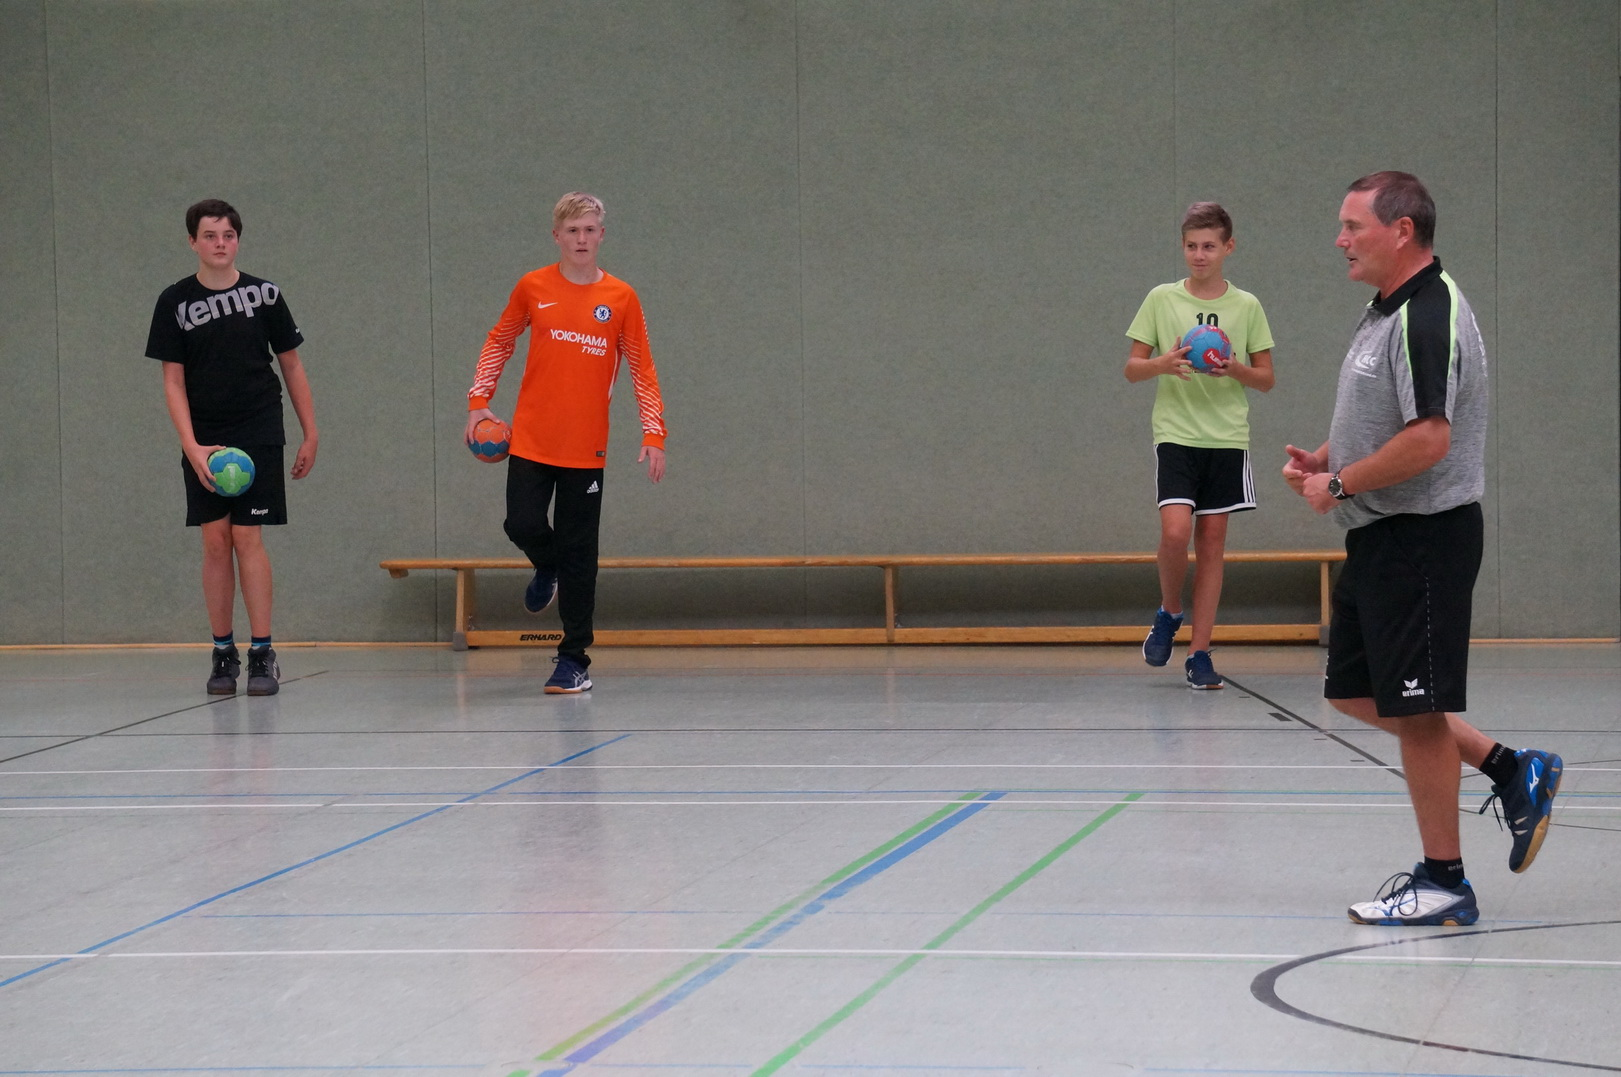 201808_Handballcamp_SDH_MG_047w